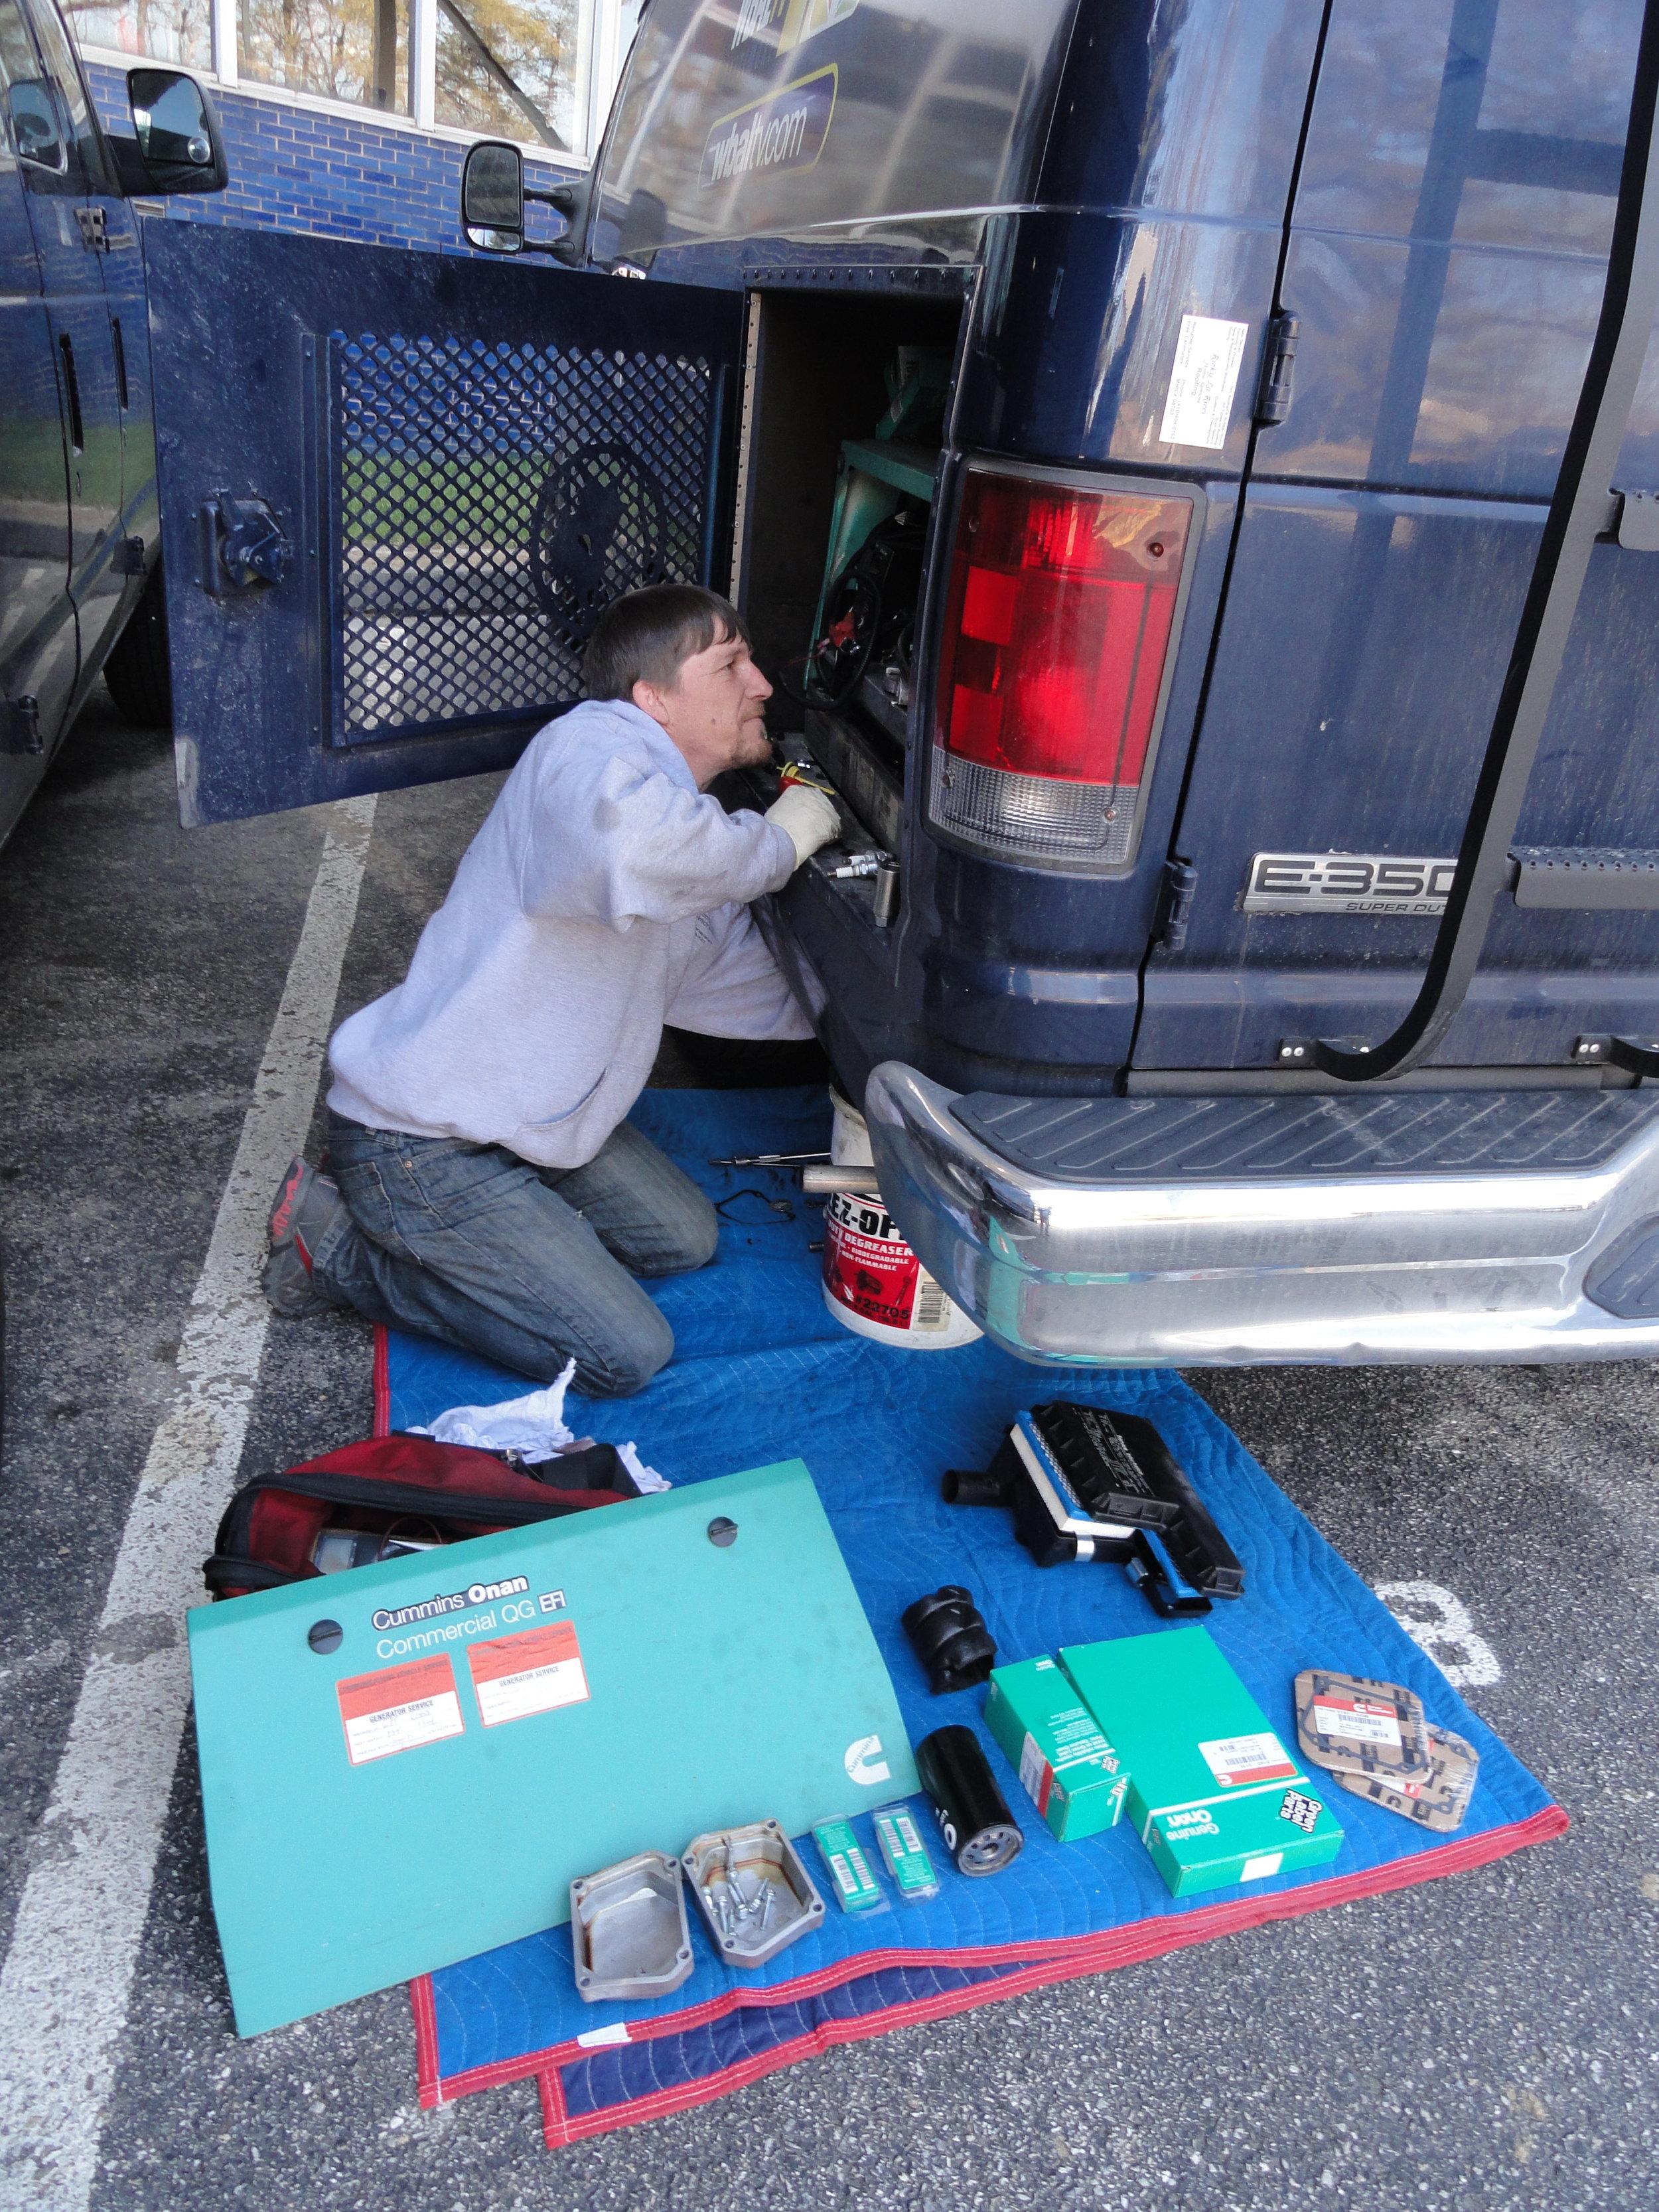 65 CVS - Service - Onsite Generator Maintenance pic #1.JPG